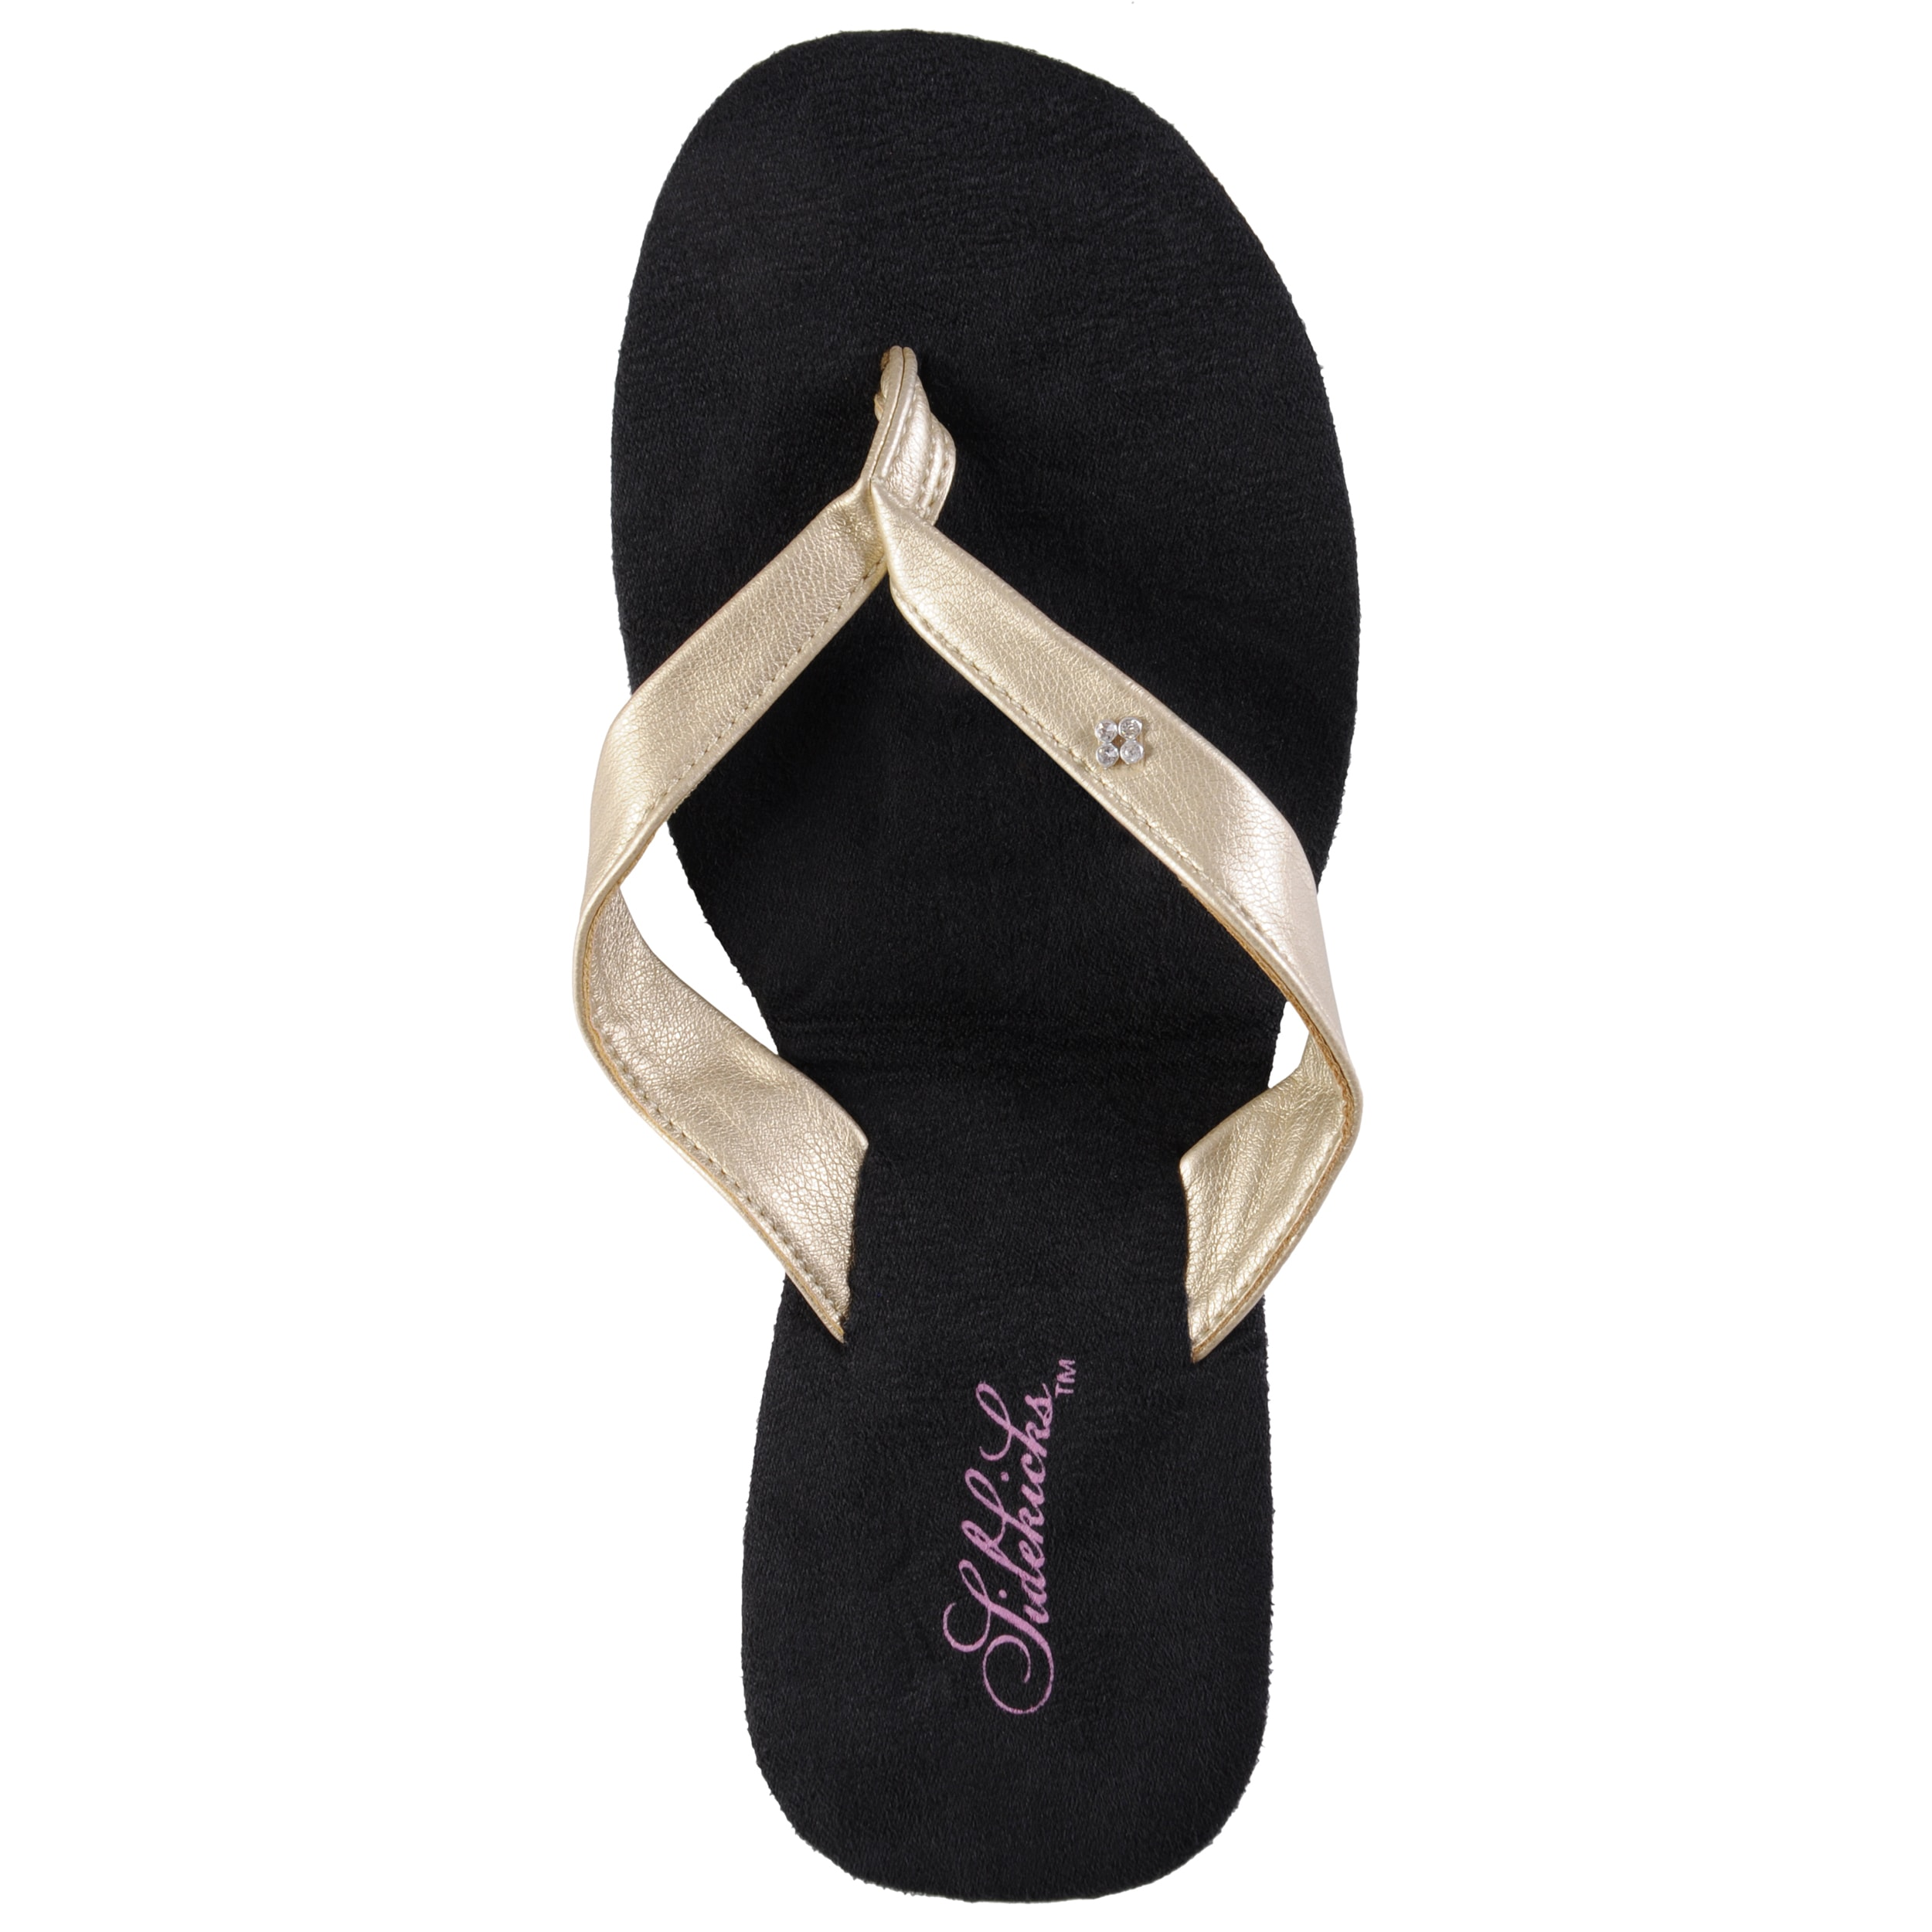 Sidekicks Foldable Flip Flops